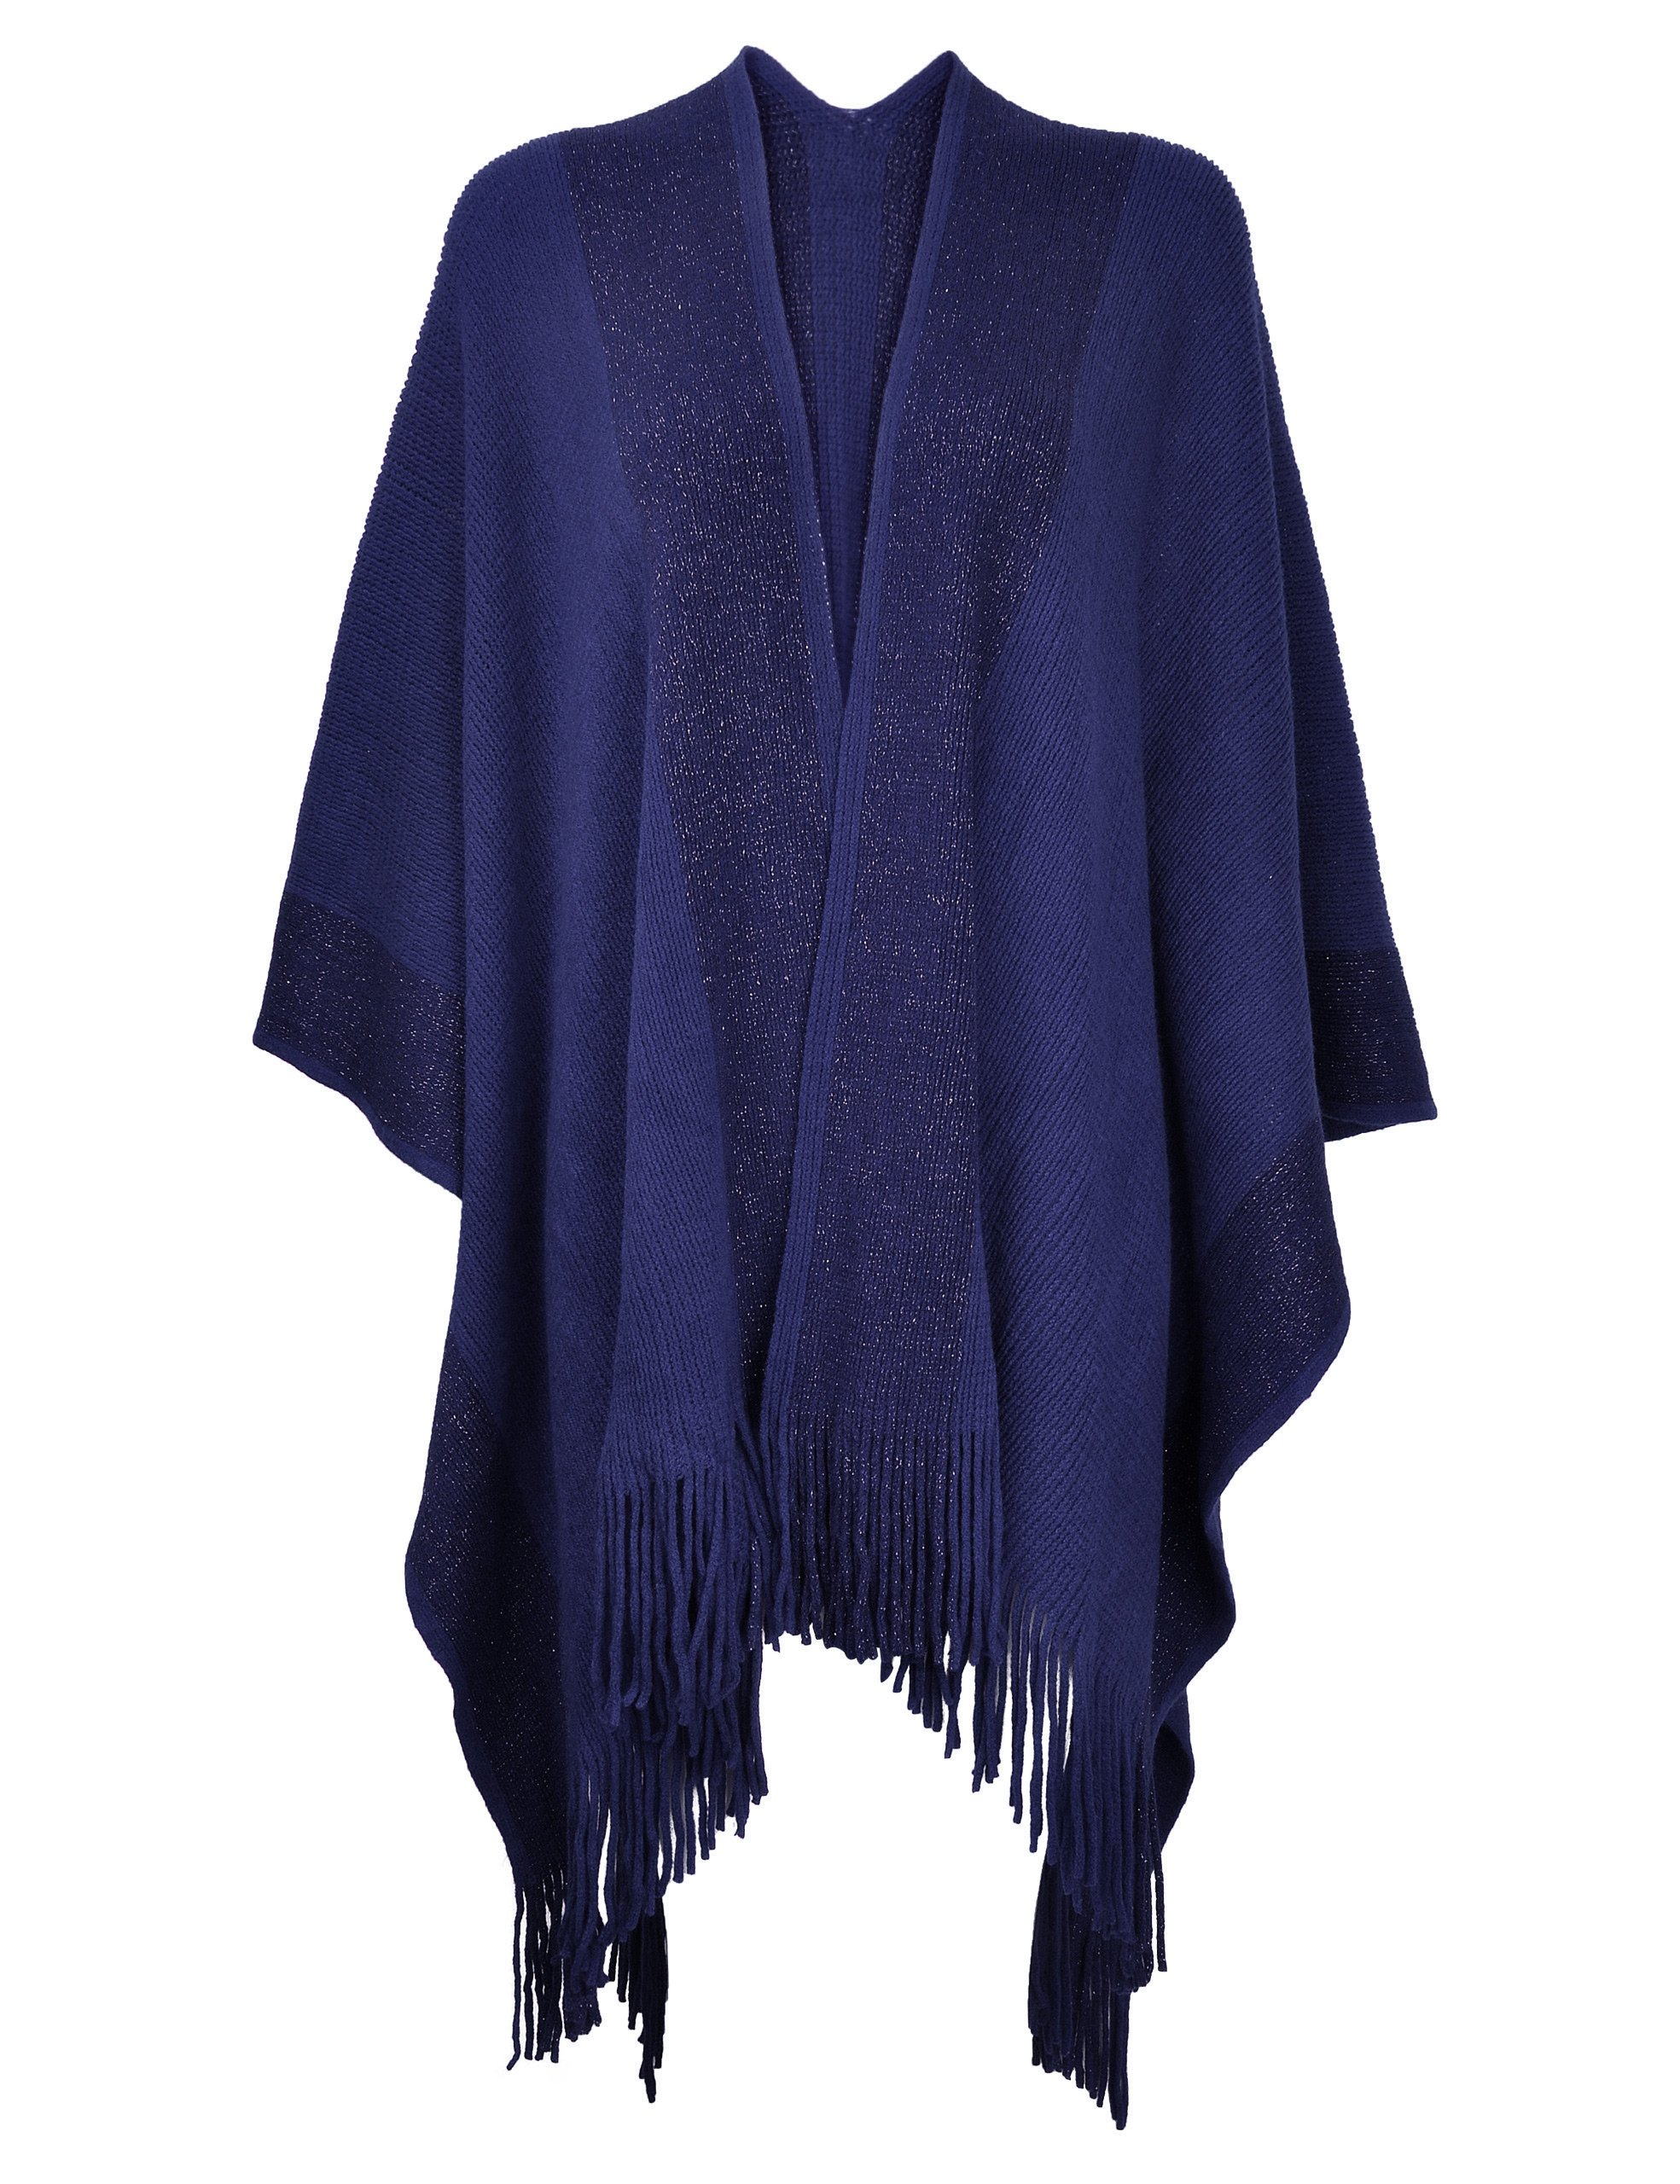 ZLYC Women's Shawl Golden Trim Knit Blanket Wrap Fringe Poncho Coat Cardigan (Navy)